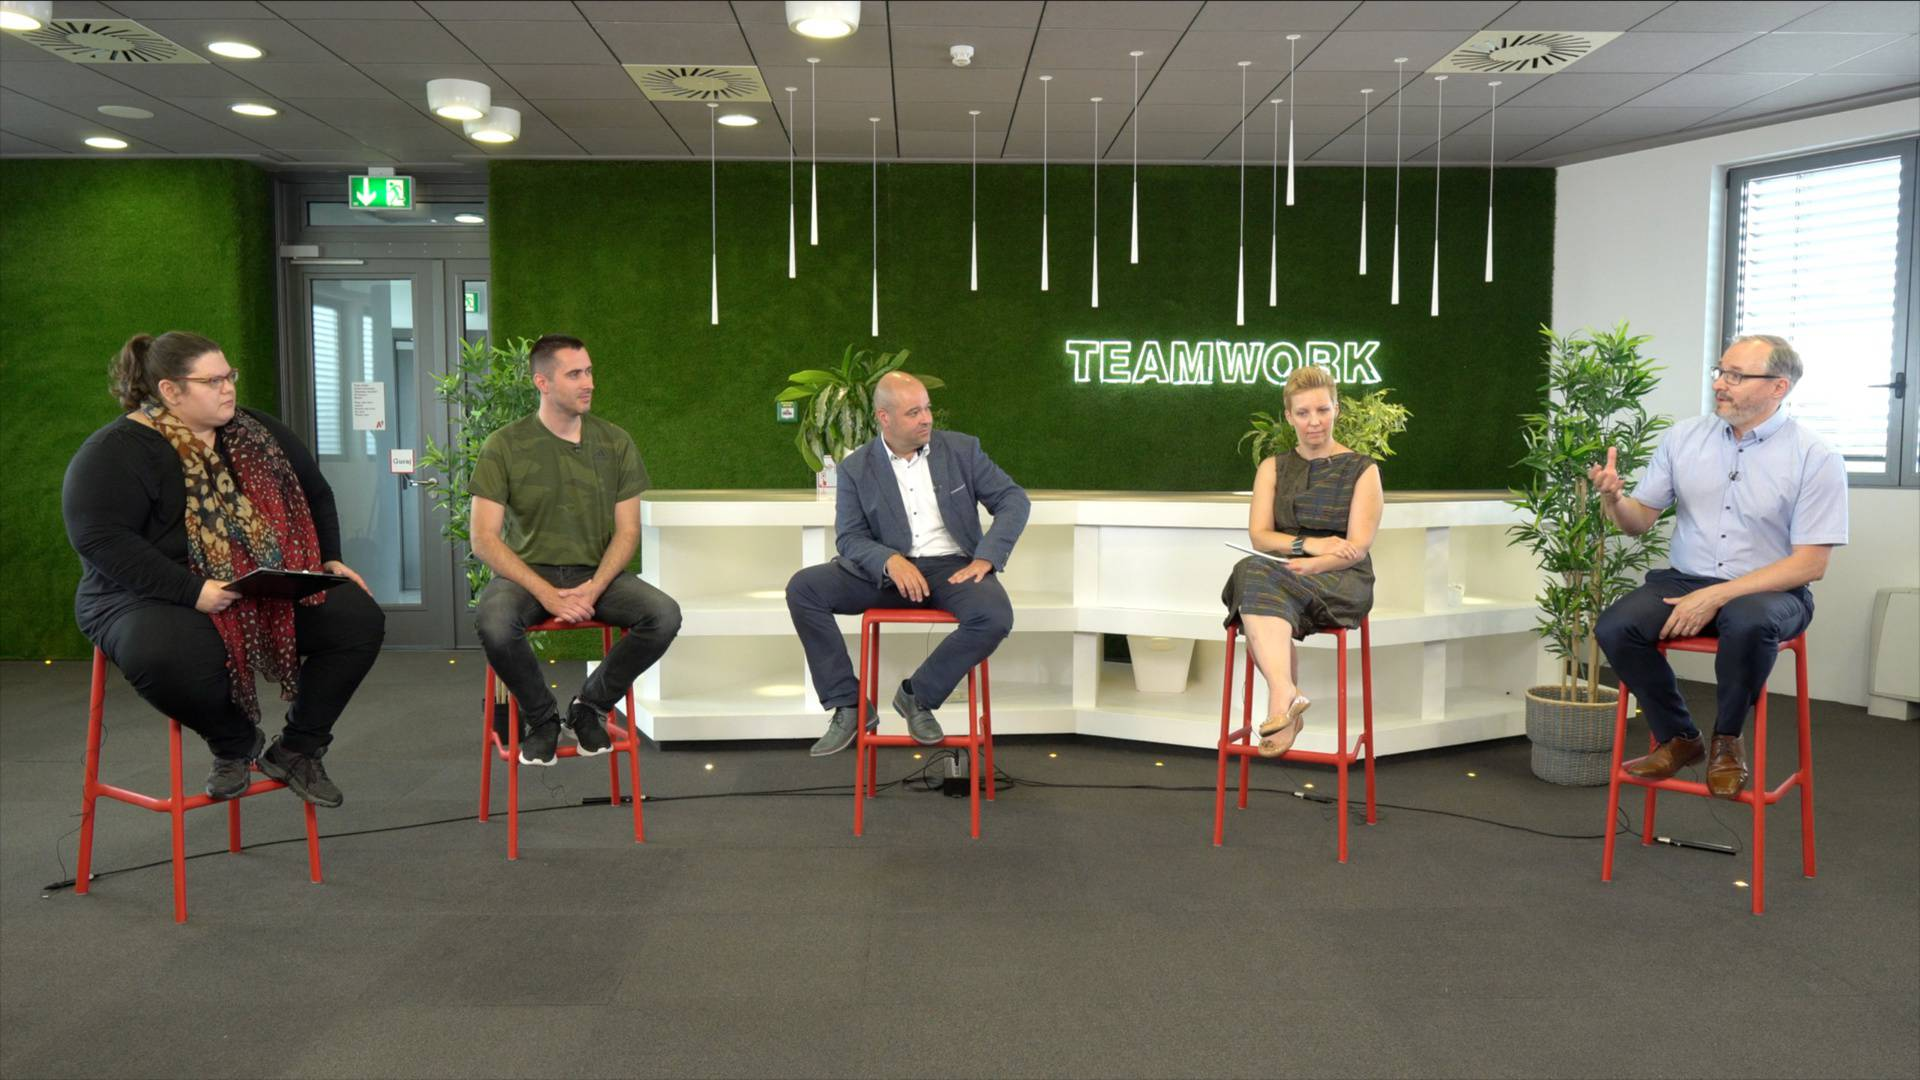 Vedrana Pribičević (ZŠEM), Matija Kopić (Gideon Brothers), Tomislav Makar (A1), Tatjana Skoko (Microsoft), Damir Sabol (Photomath)